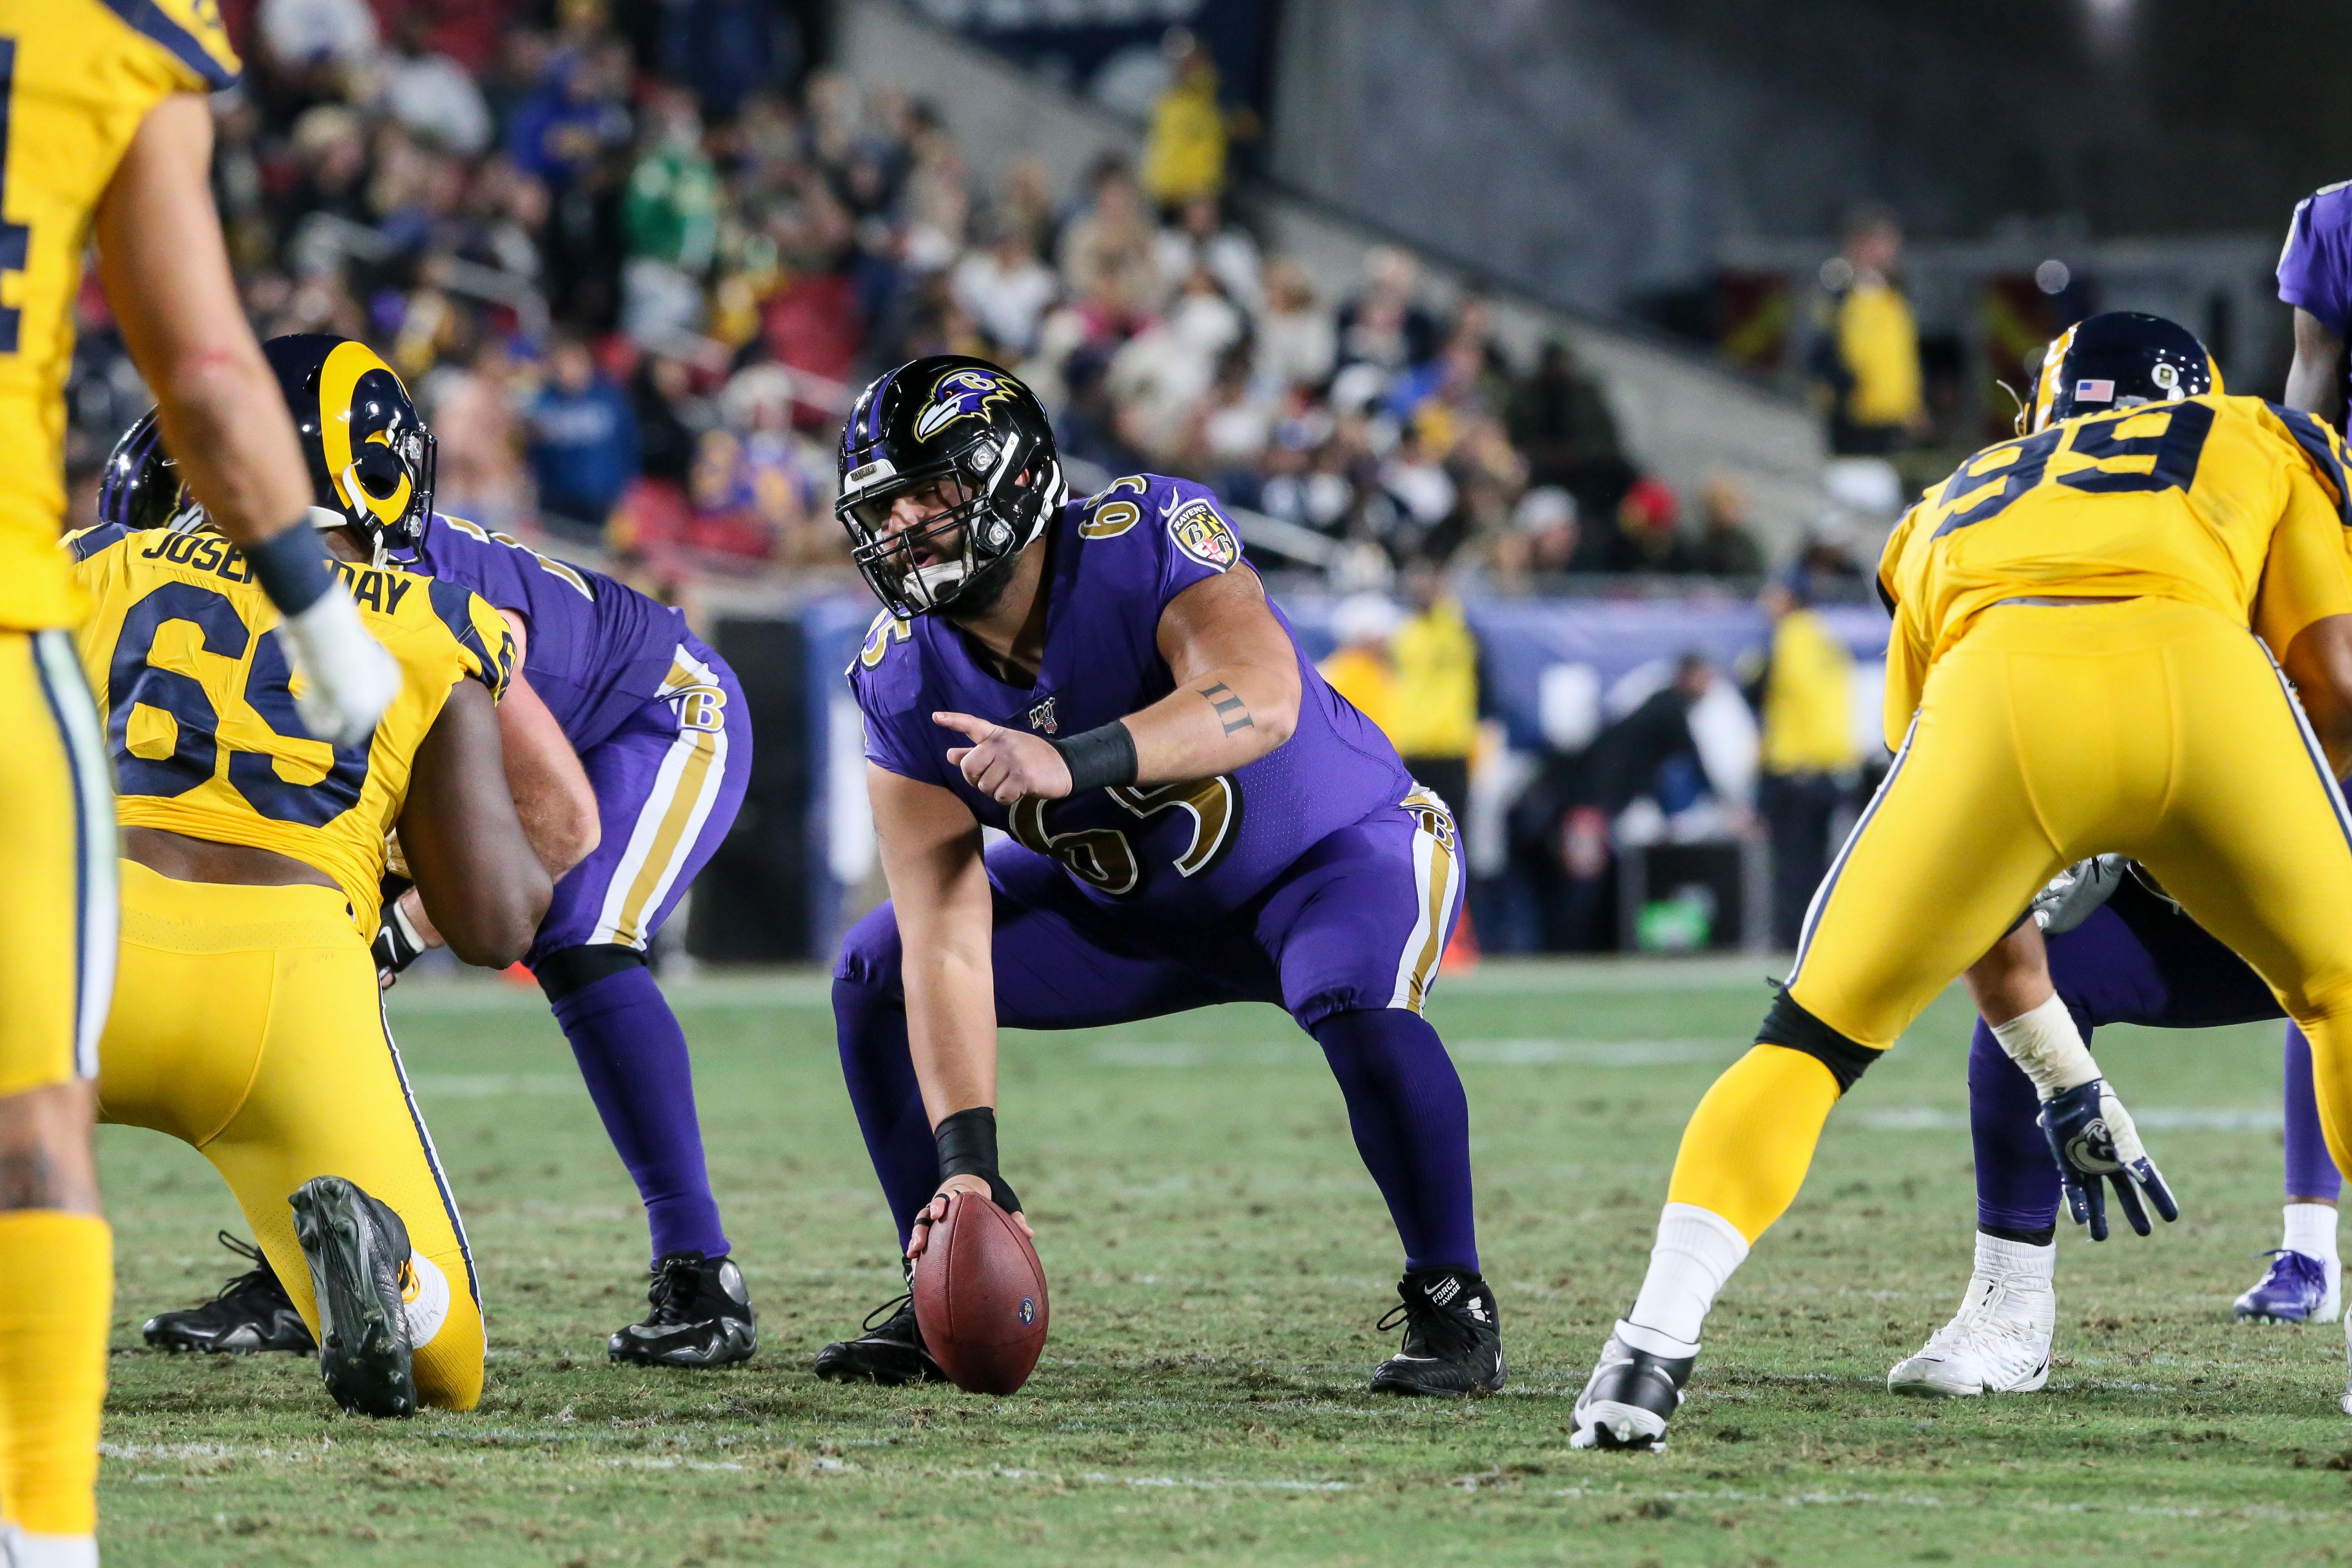 NFL: NOV 25 Ravens at Rams